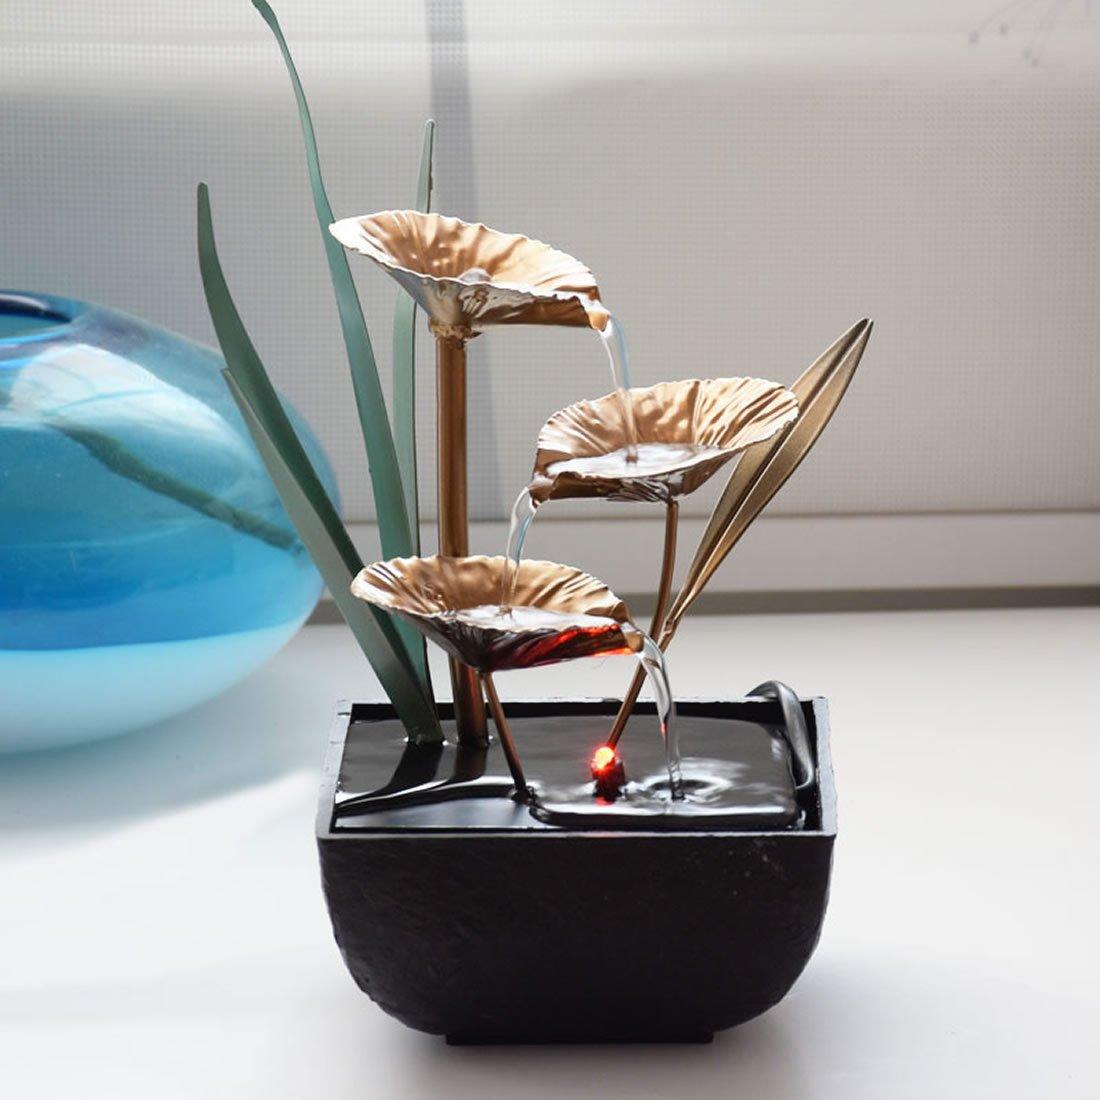 jardin feng shui comment obtenir quilibre et harmonie. Black Bedroom Furniture Sets. Home Design Ideas